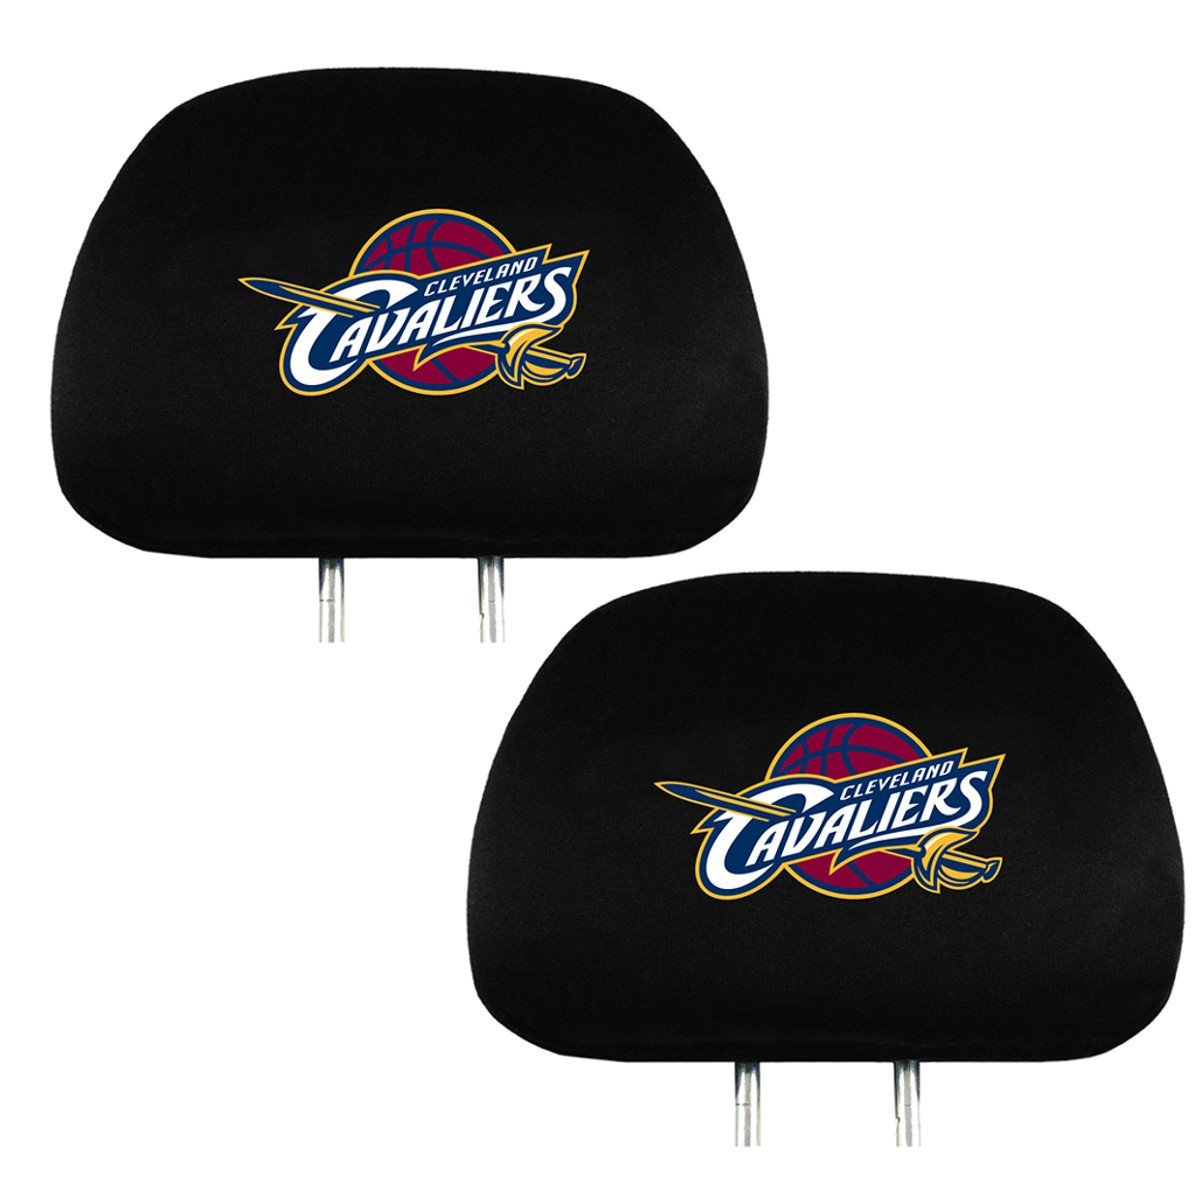 Official National Basketball Association Fan Shop Authentic NBA Headrest Cover (Cleveland Cavaliers)